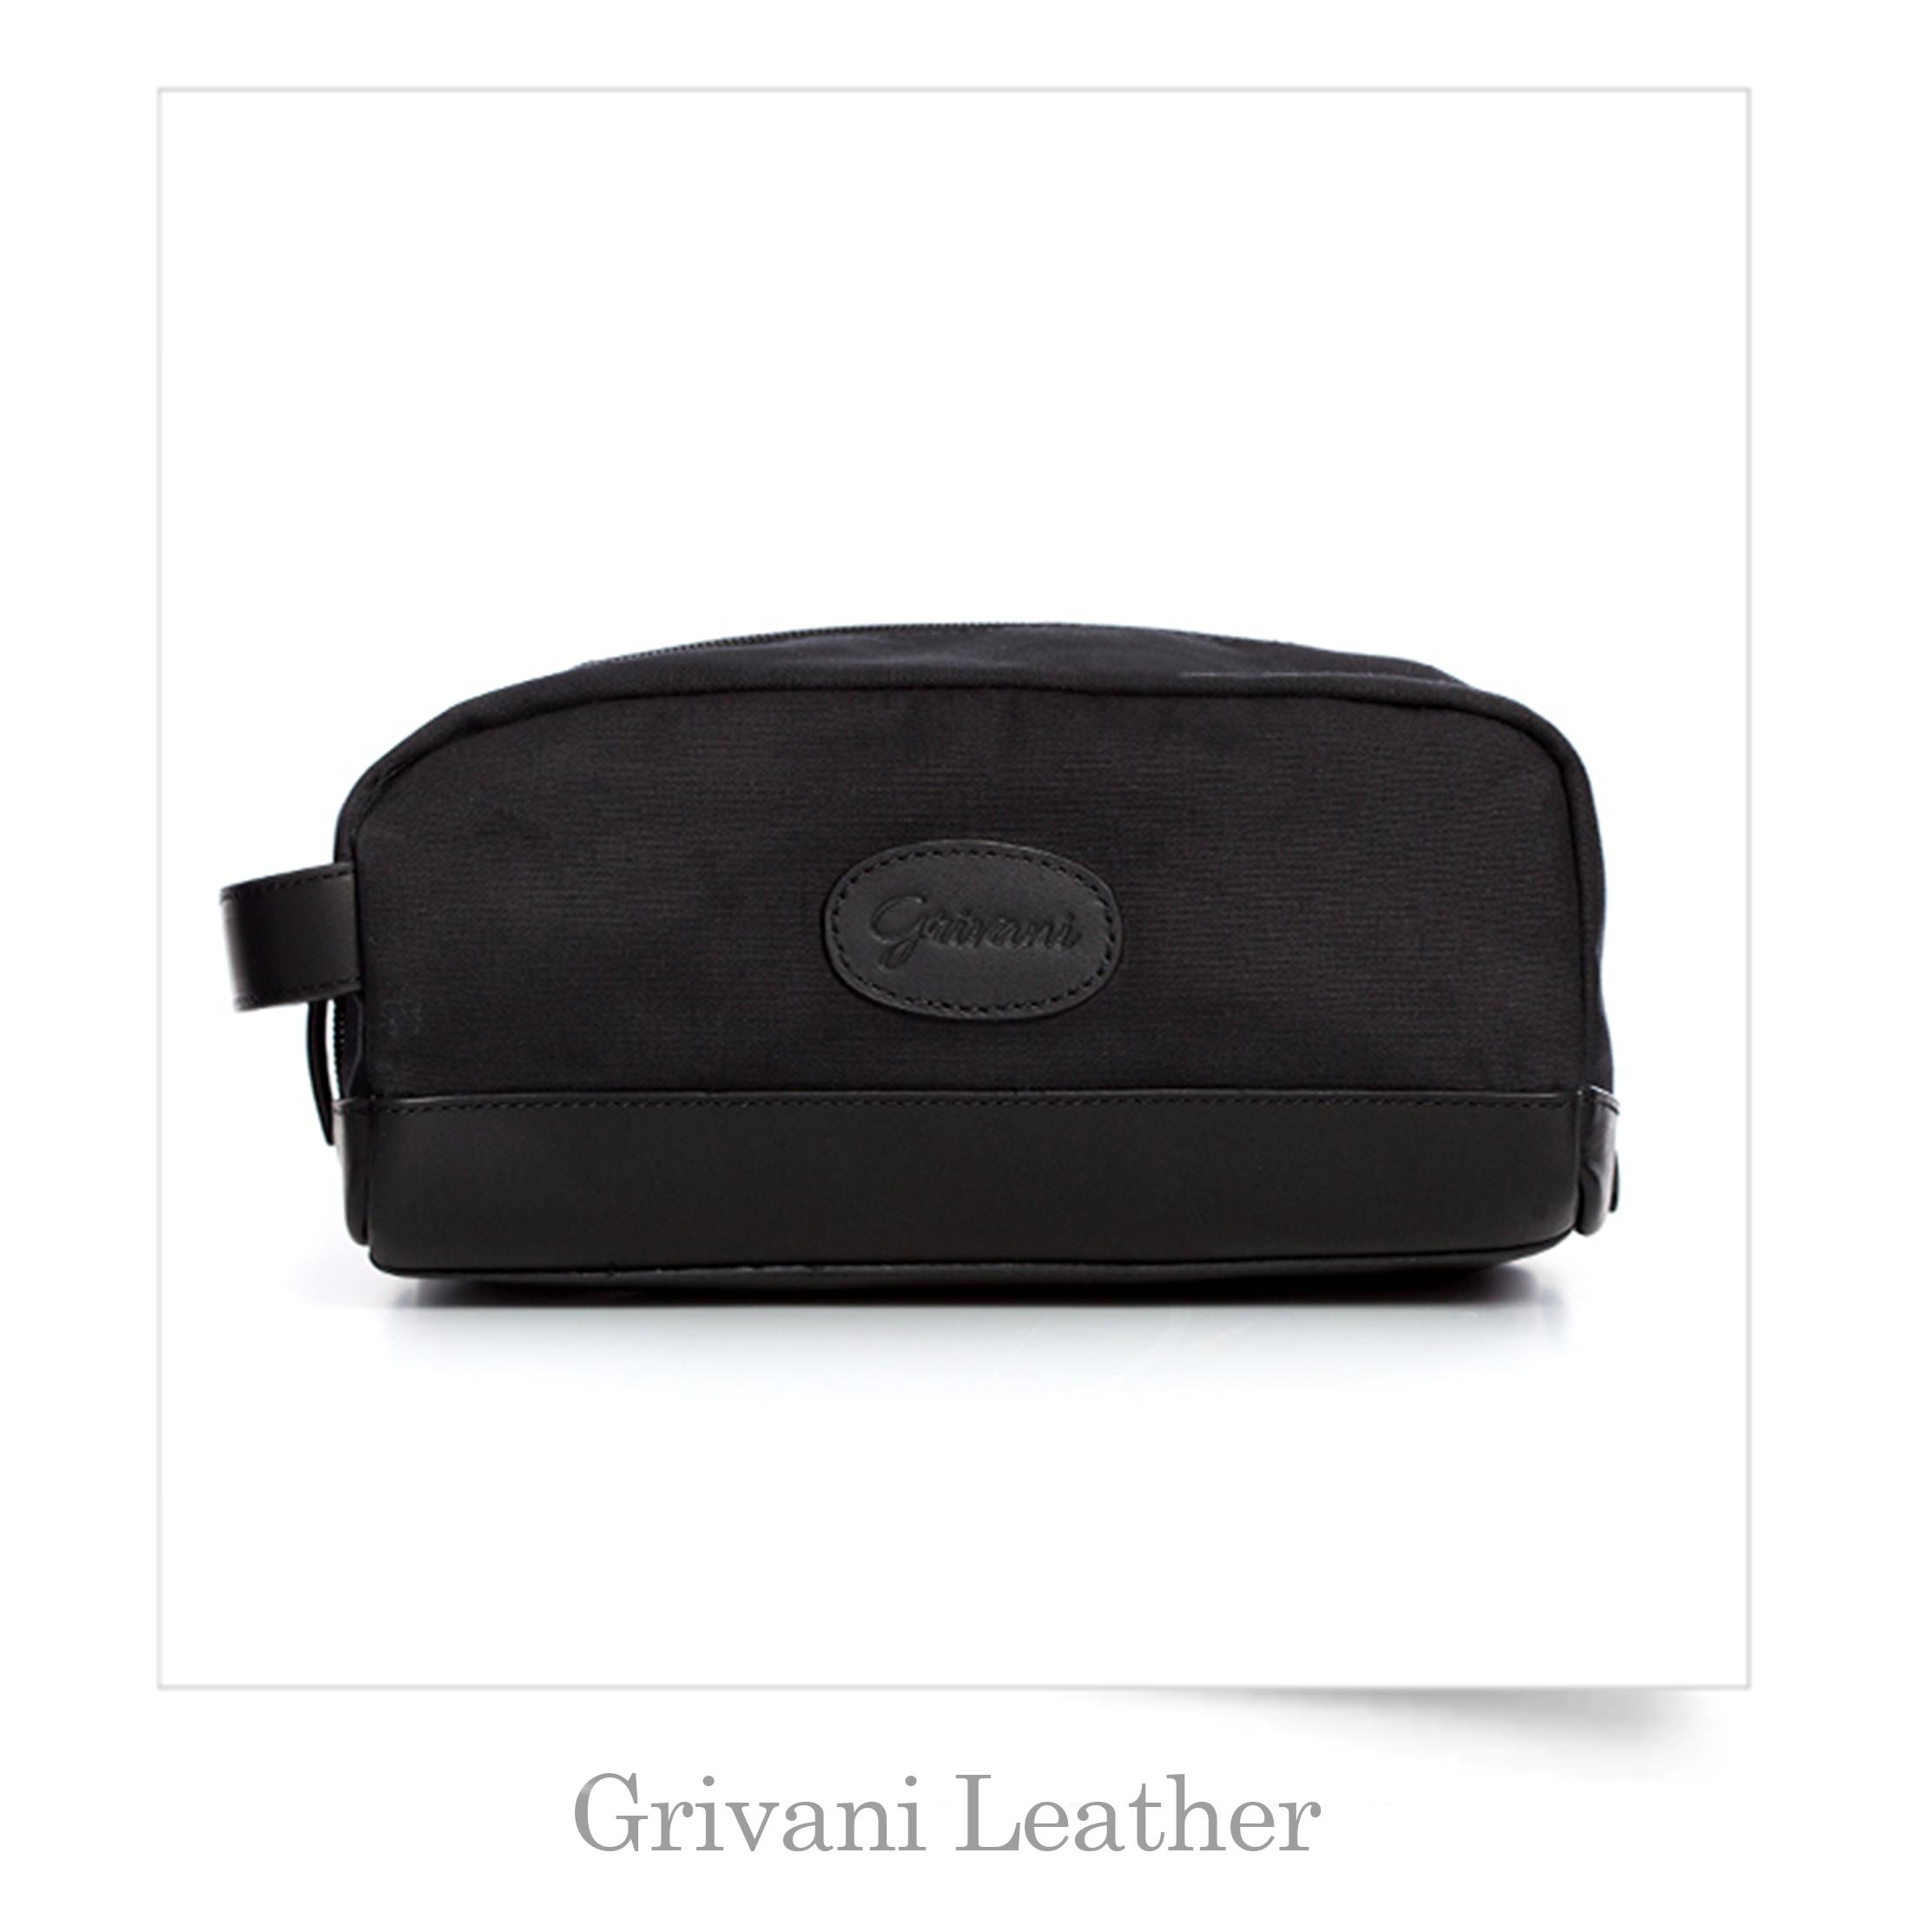 grivani leather